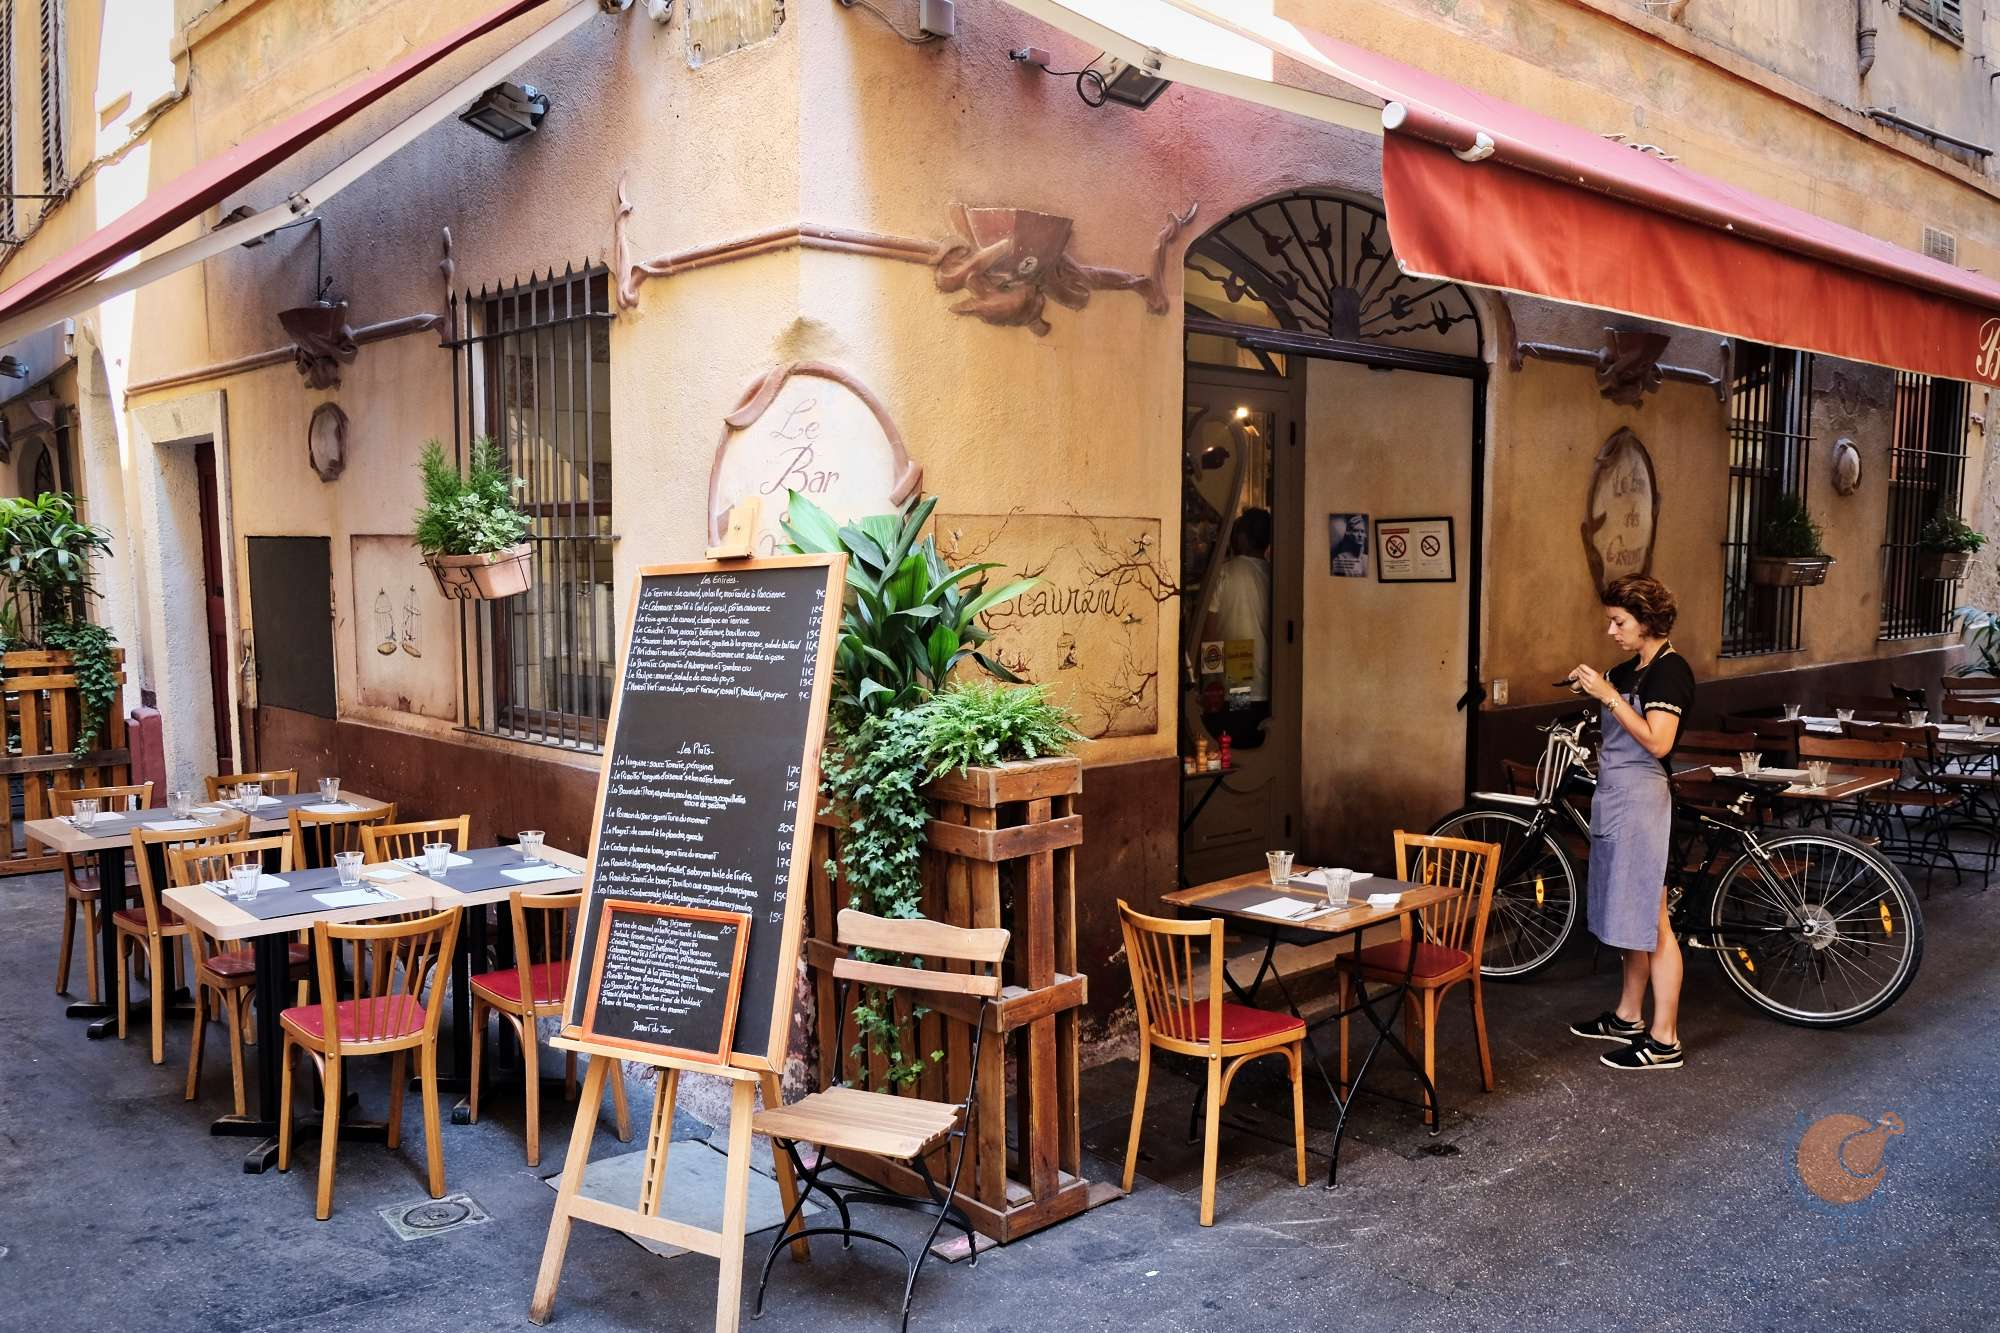 dscf1421_bar_des_oiseaux_restaurant_france_nice_nizza_vilagevo_jokuti_andras_l_w.jpg